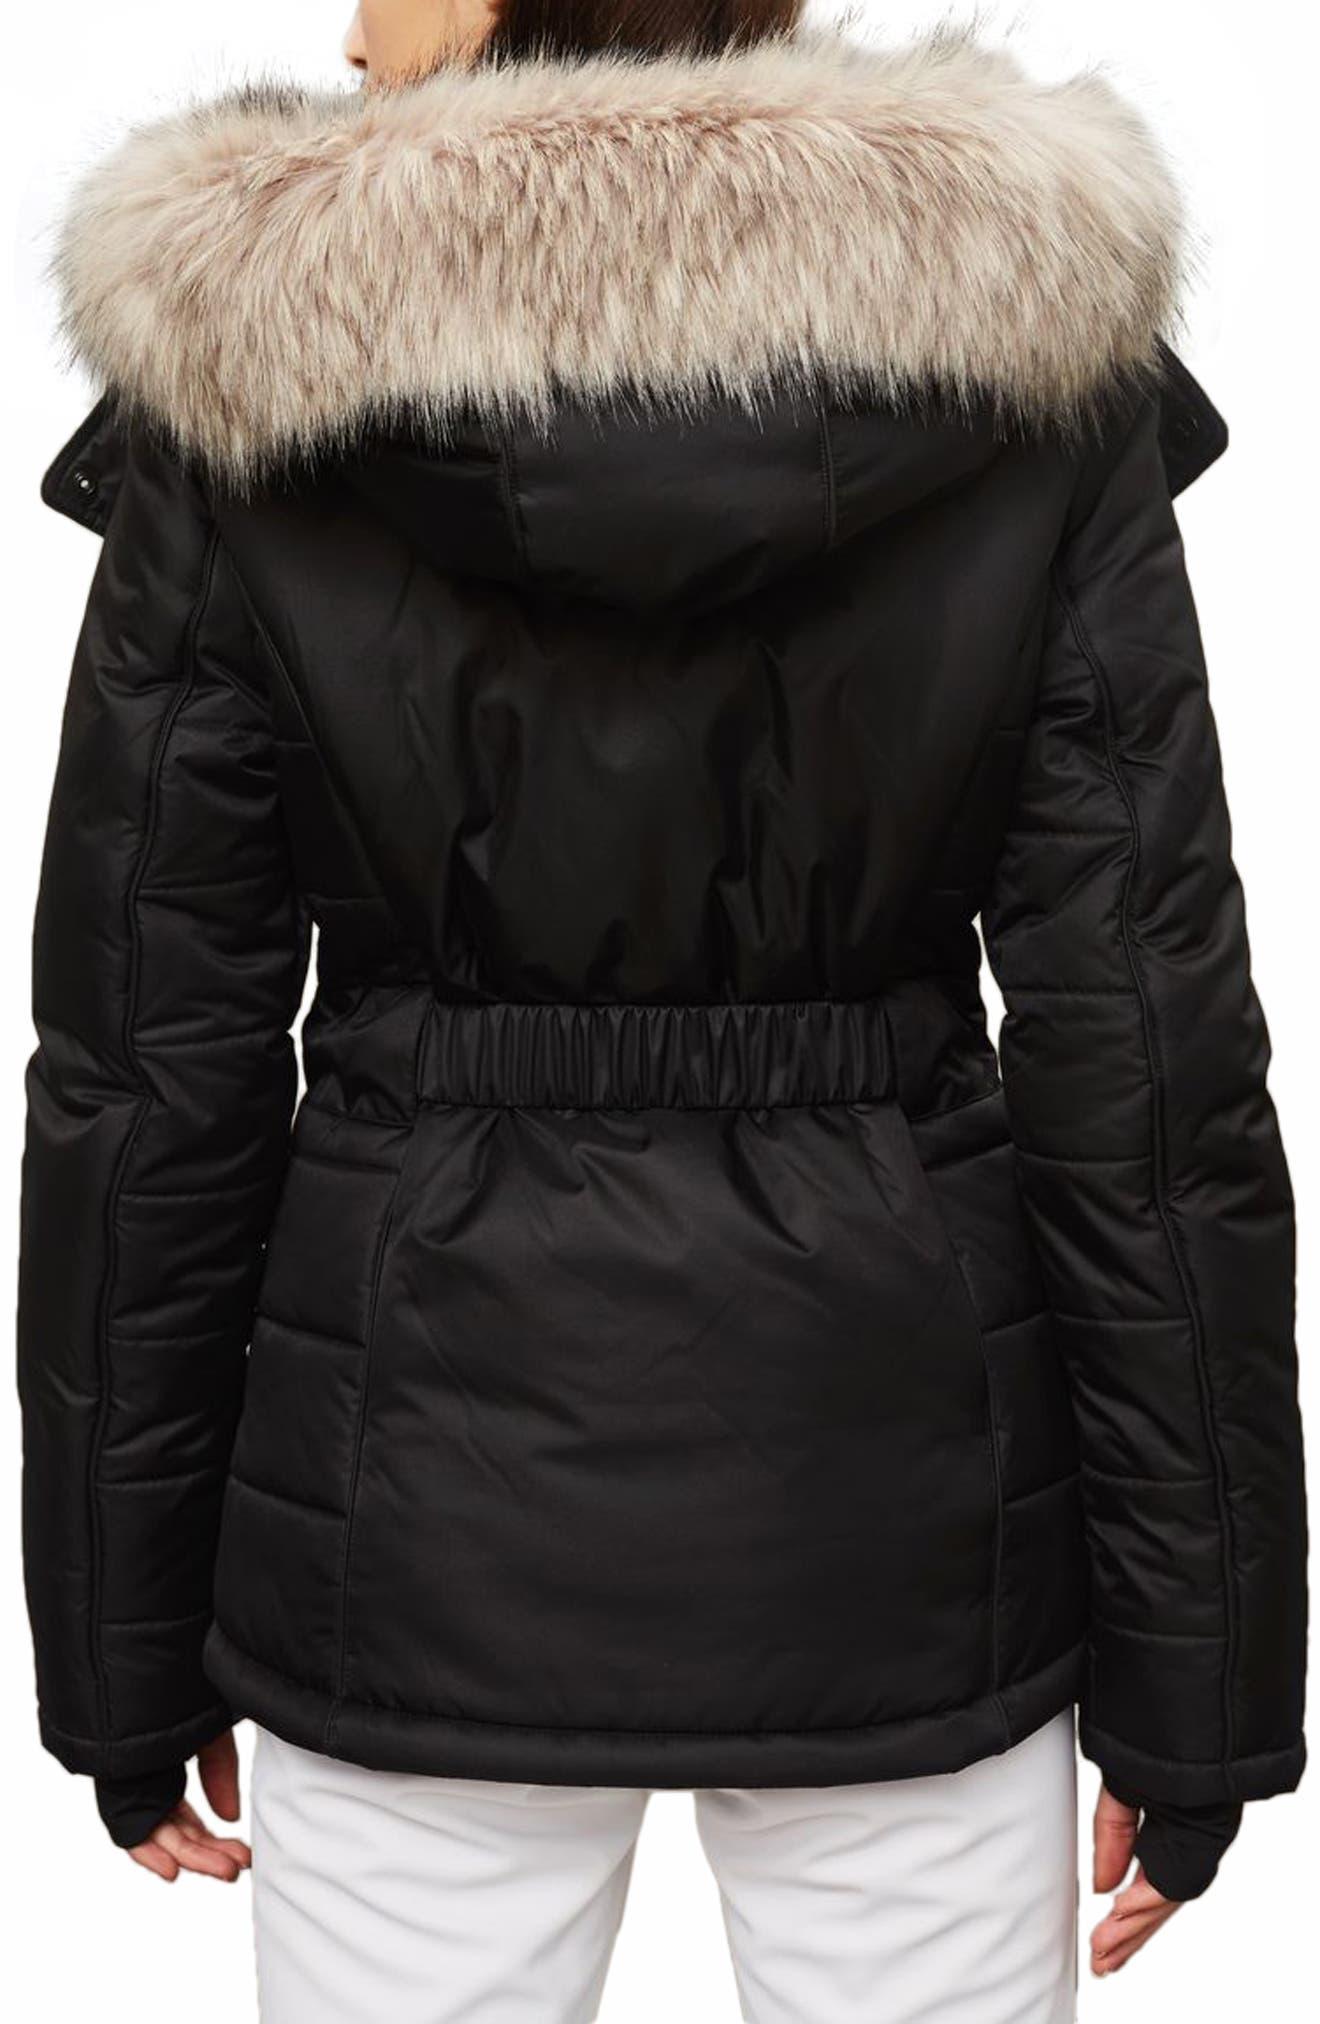 SNO Amazon Puffer Jacket,                             Alternate thumbnail 2, color,                             001